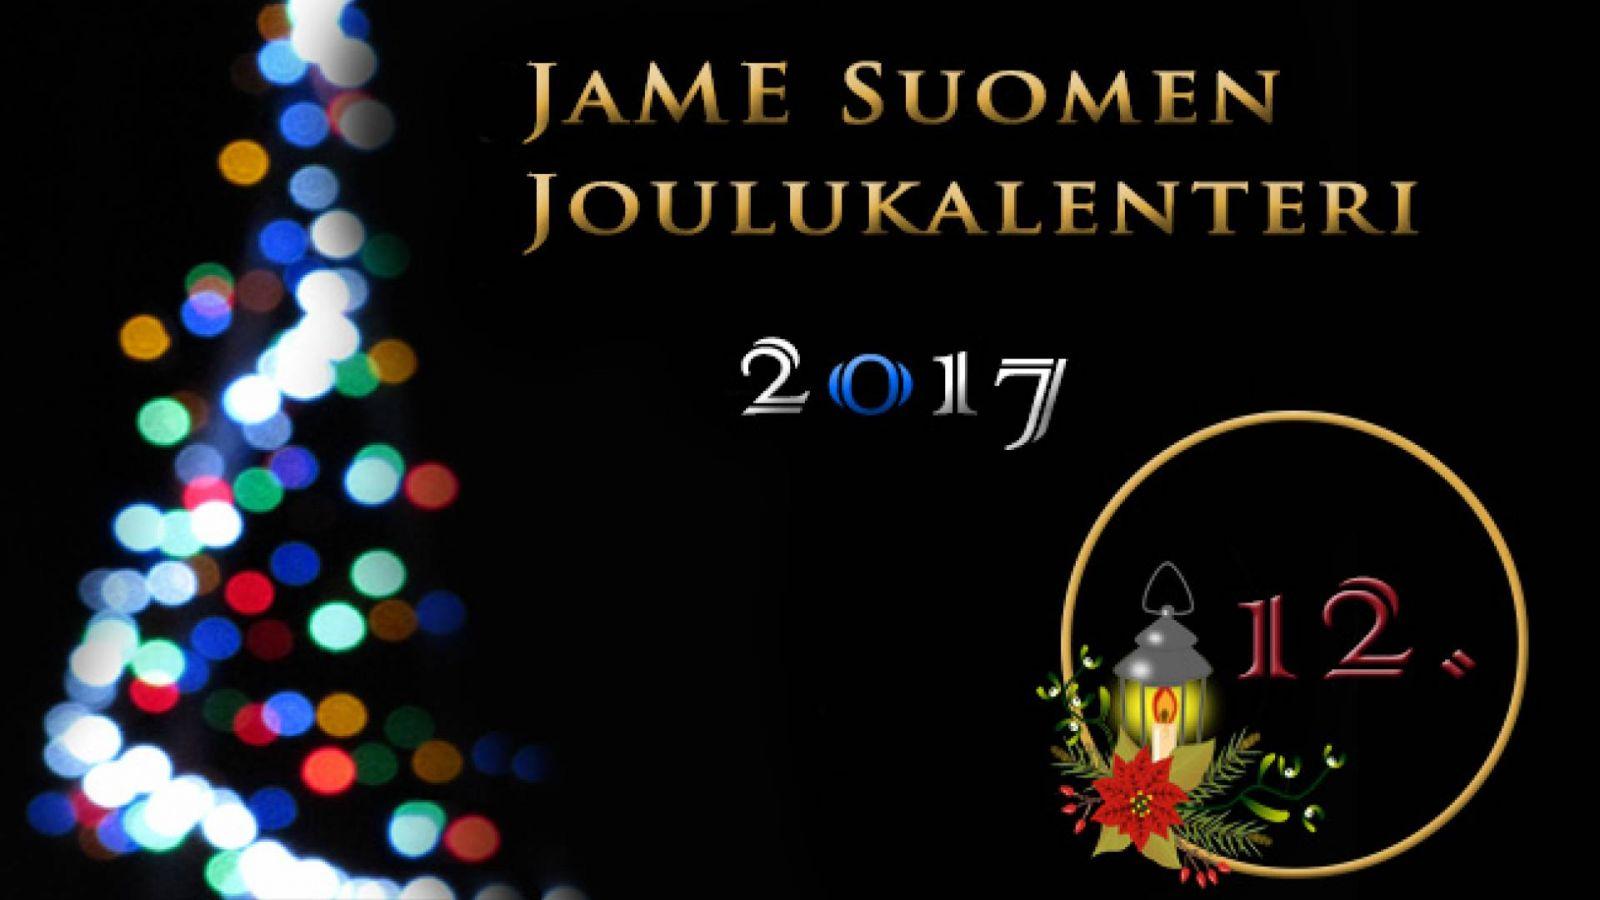 JaME Suomen joulukalenterin 12. luukku © Nipsu